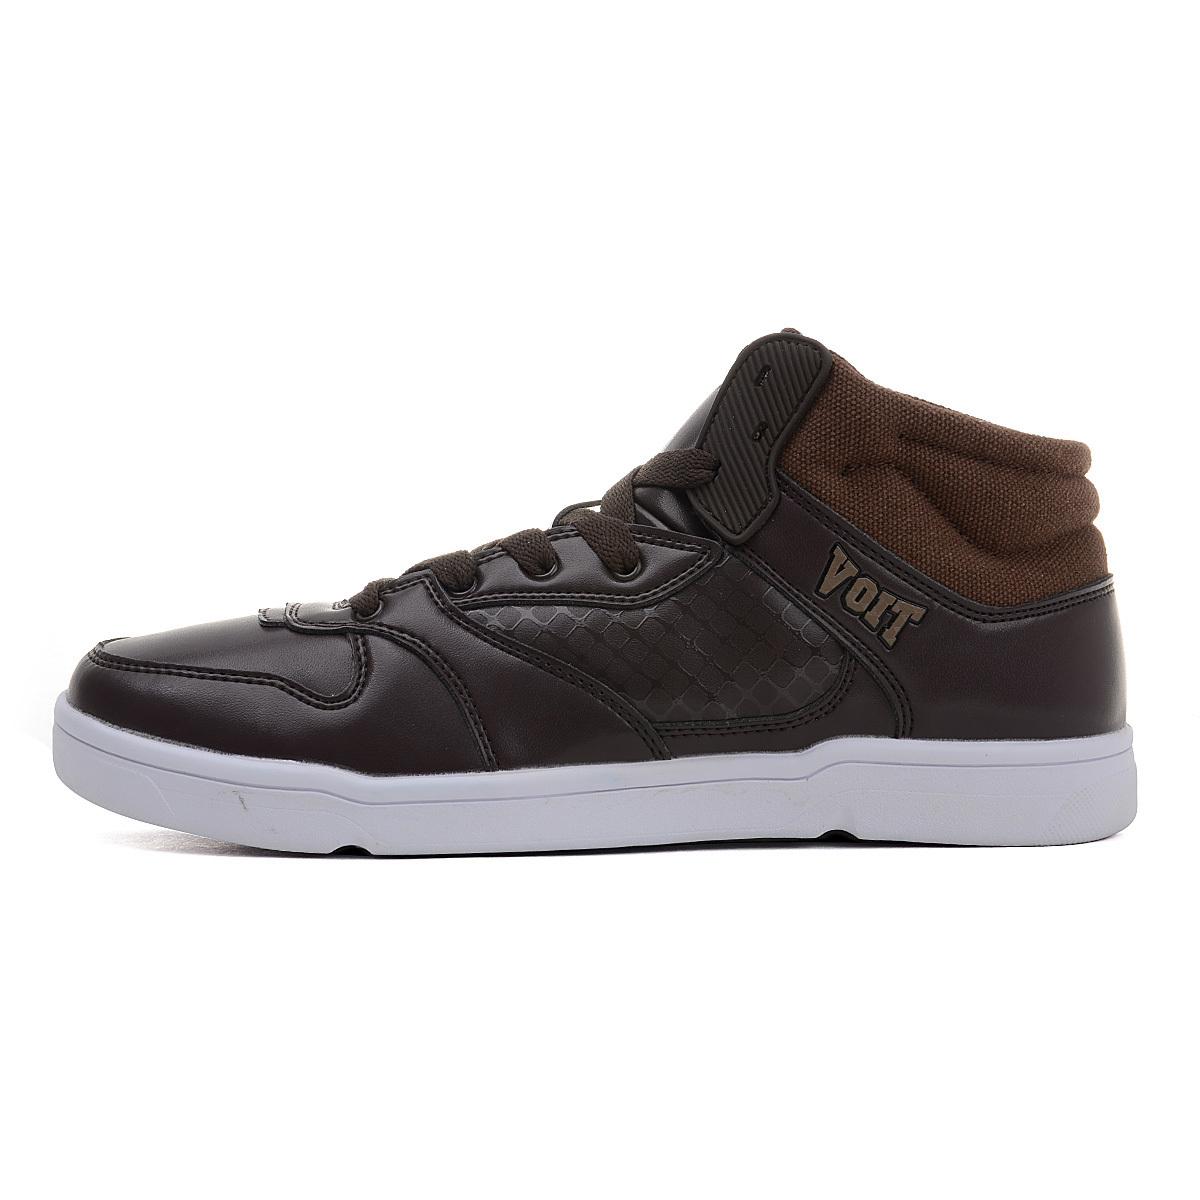 Спортивные носки APRO VOIT 2SM03415 229